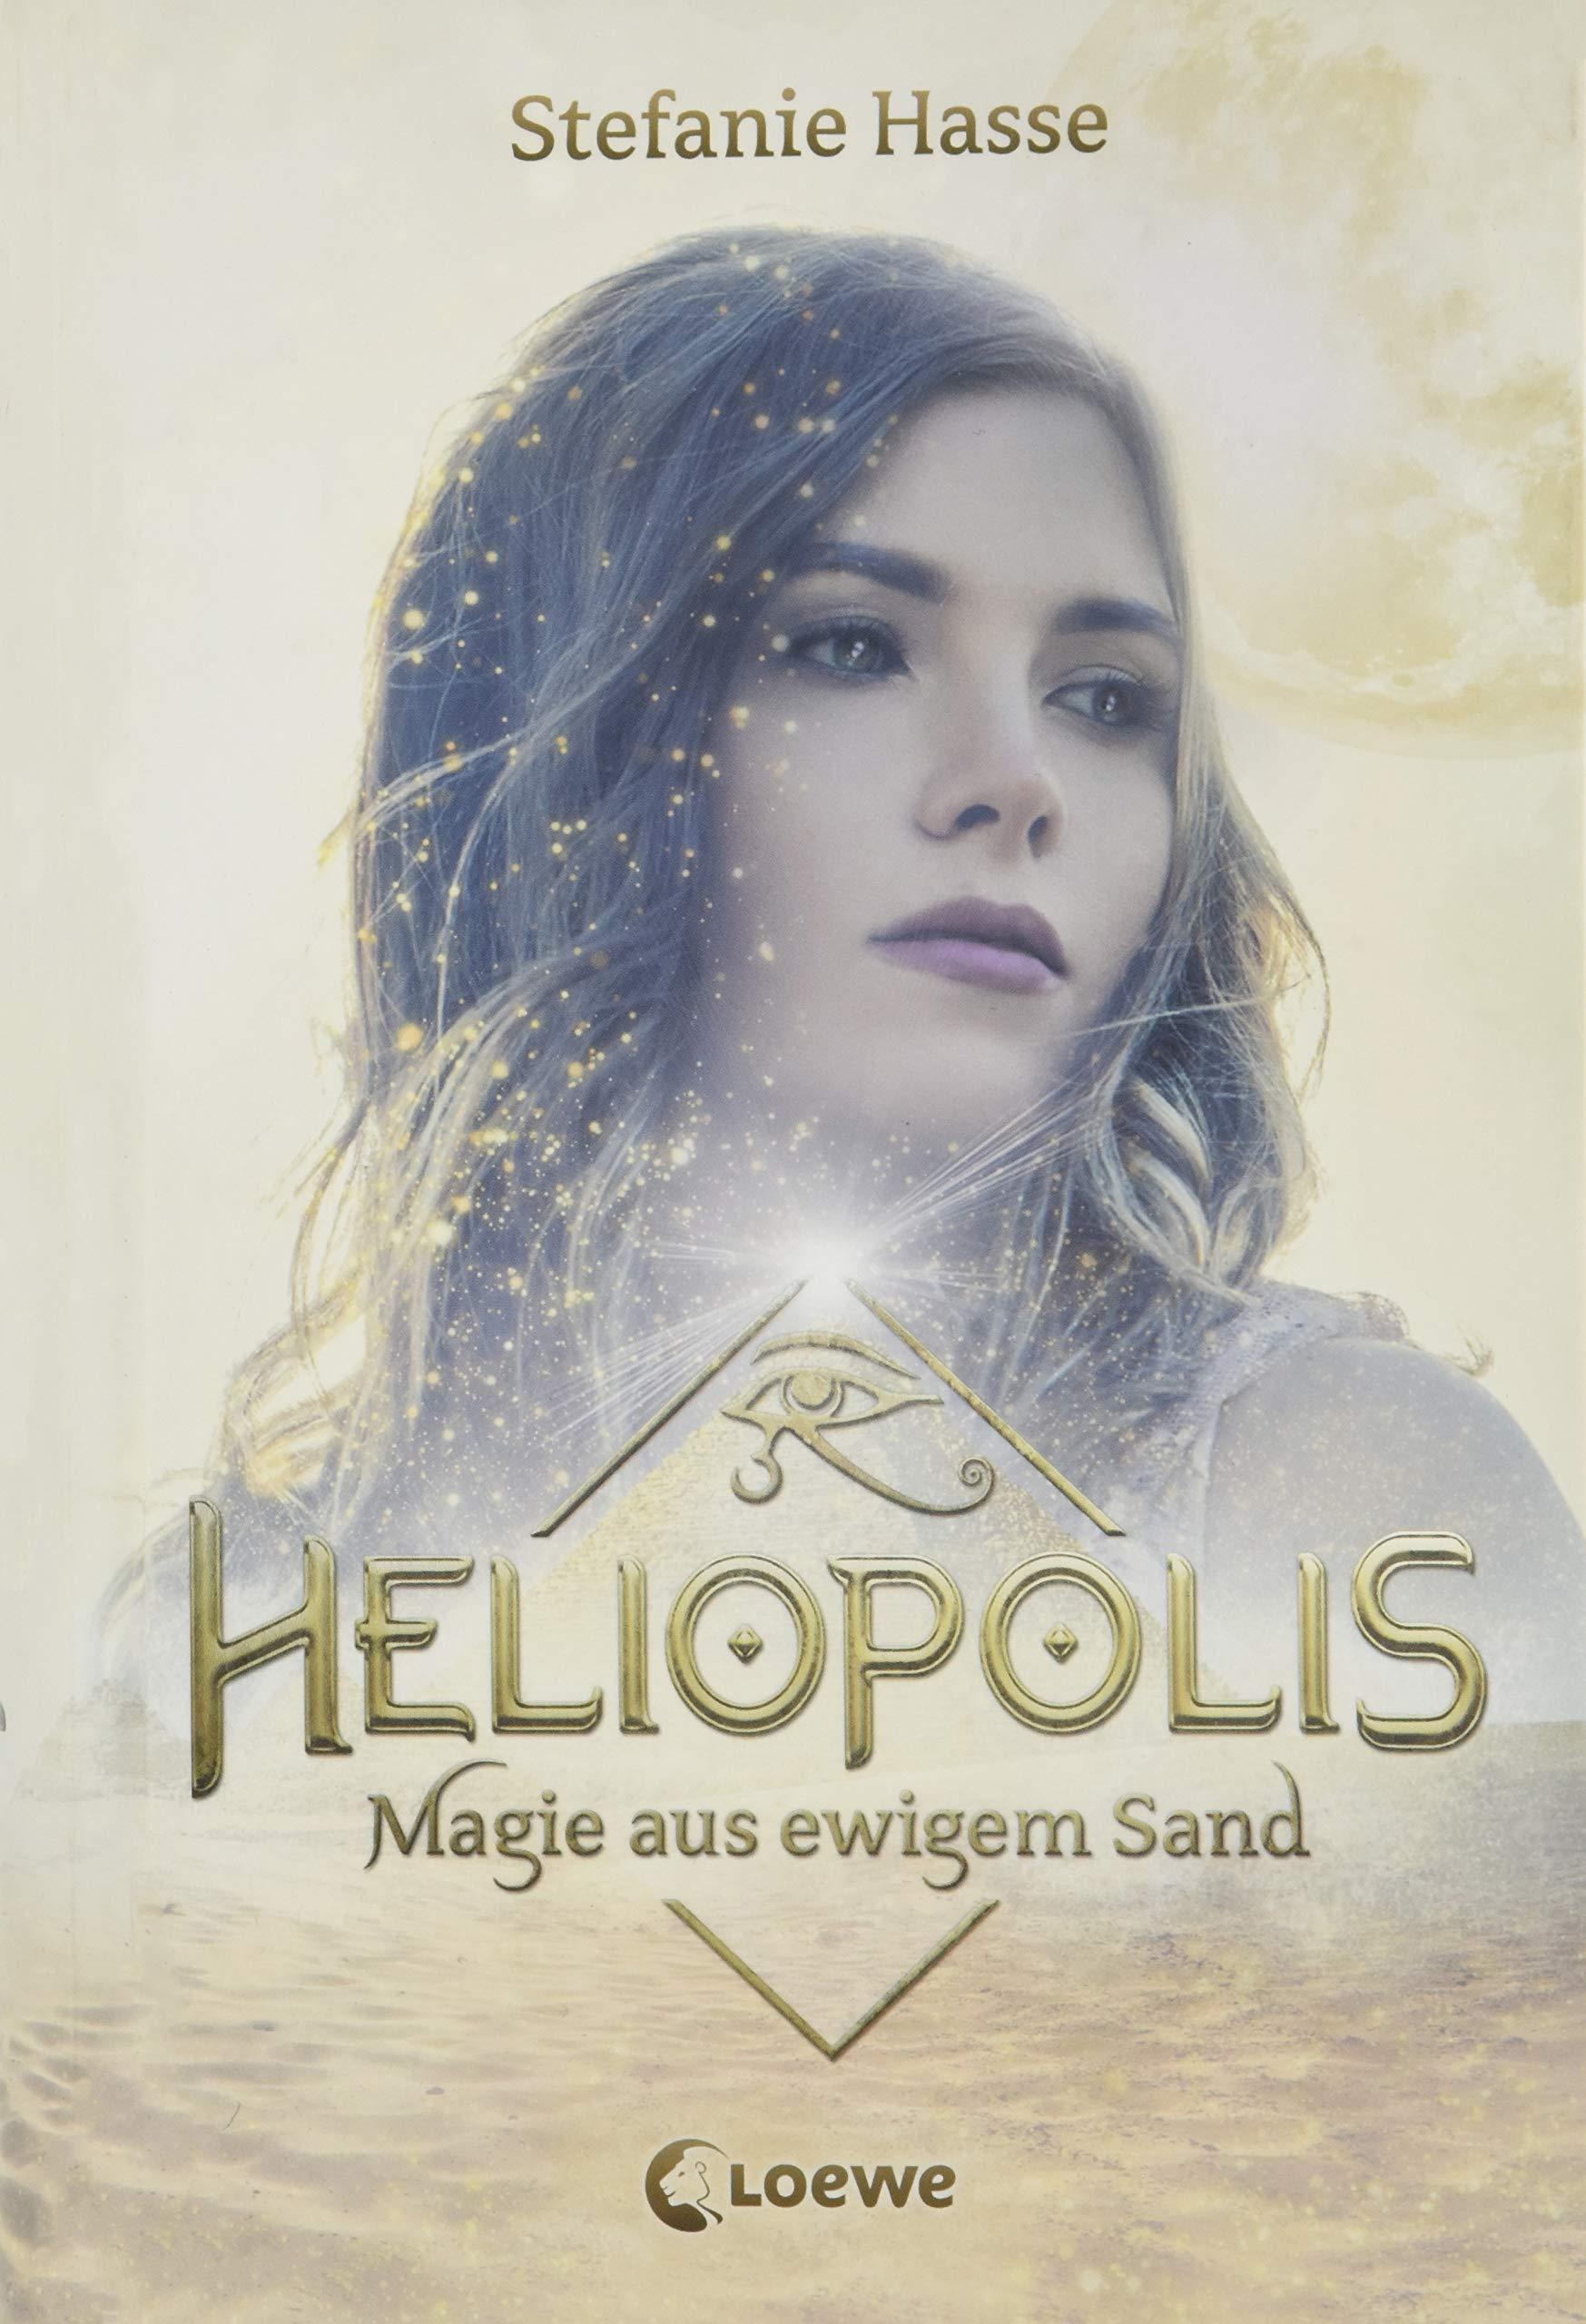 Heliopolis - Magie aus ewigem Sand Gebundenes Buch – 24. Juli 2018 Stefanie Hasse Loewe 3743200929 Arizona